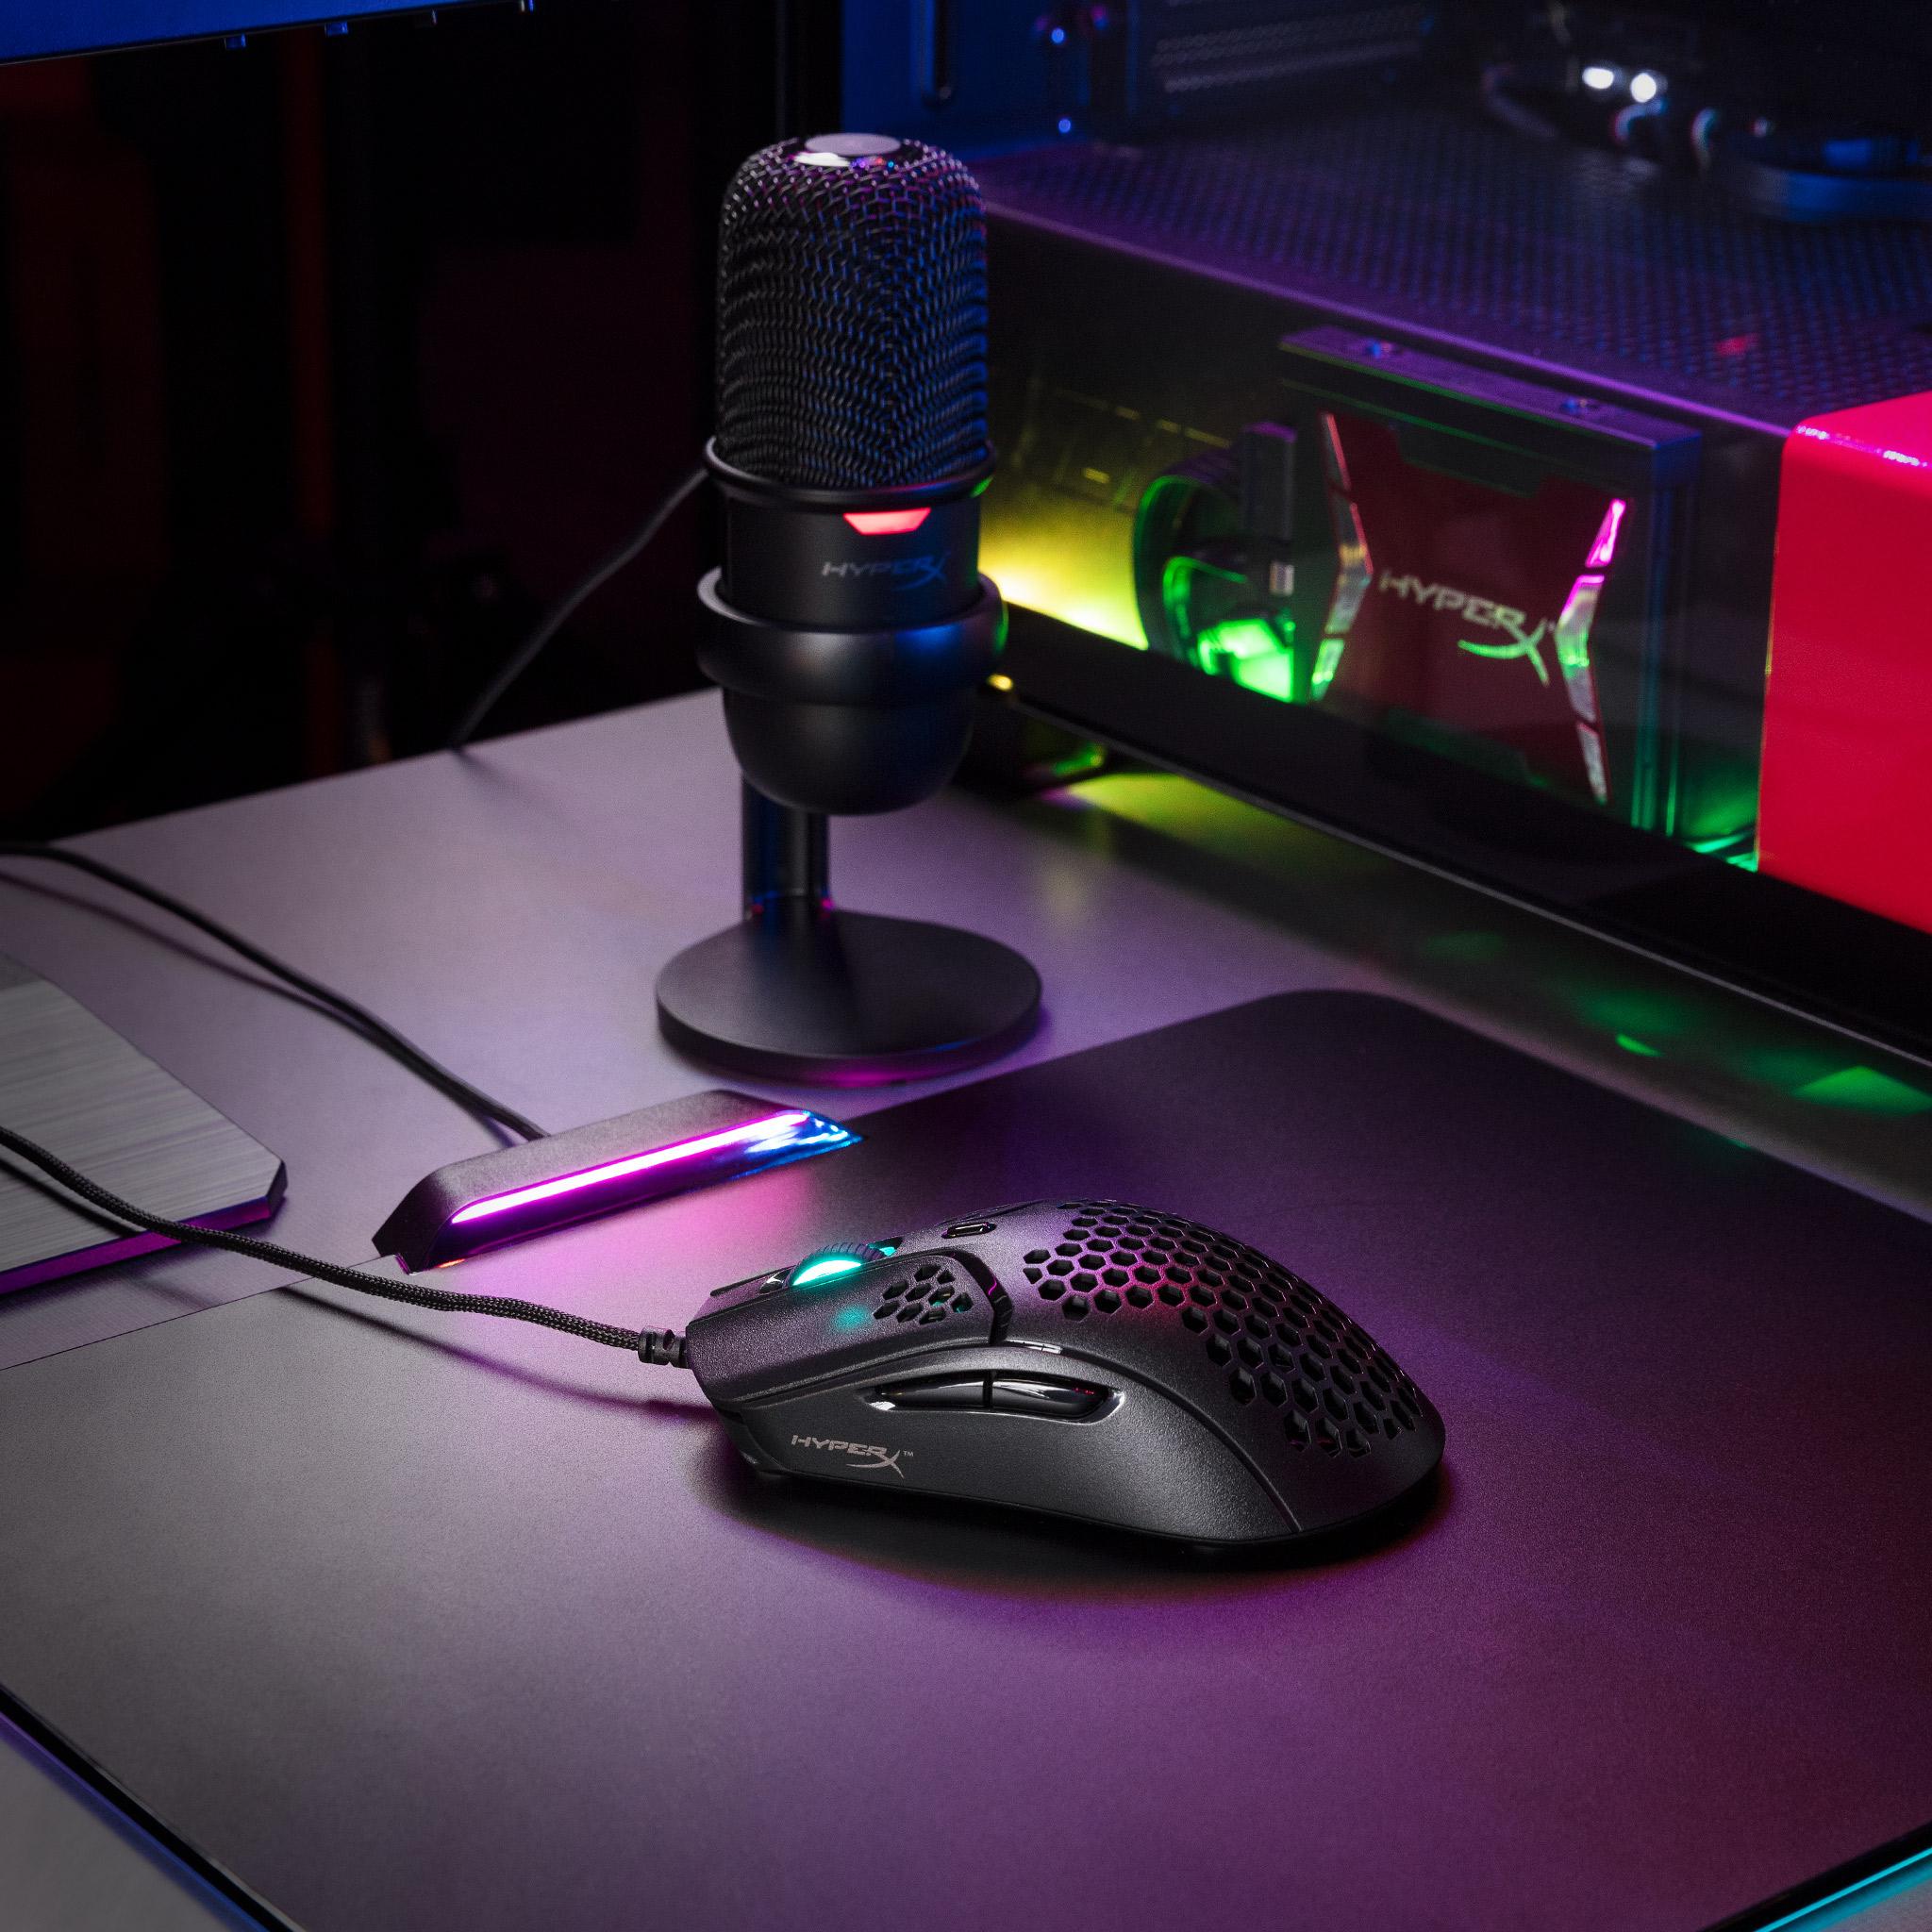 hx-product-mouse-pulsefire-haste-9-zm-lg.jpg